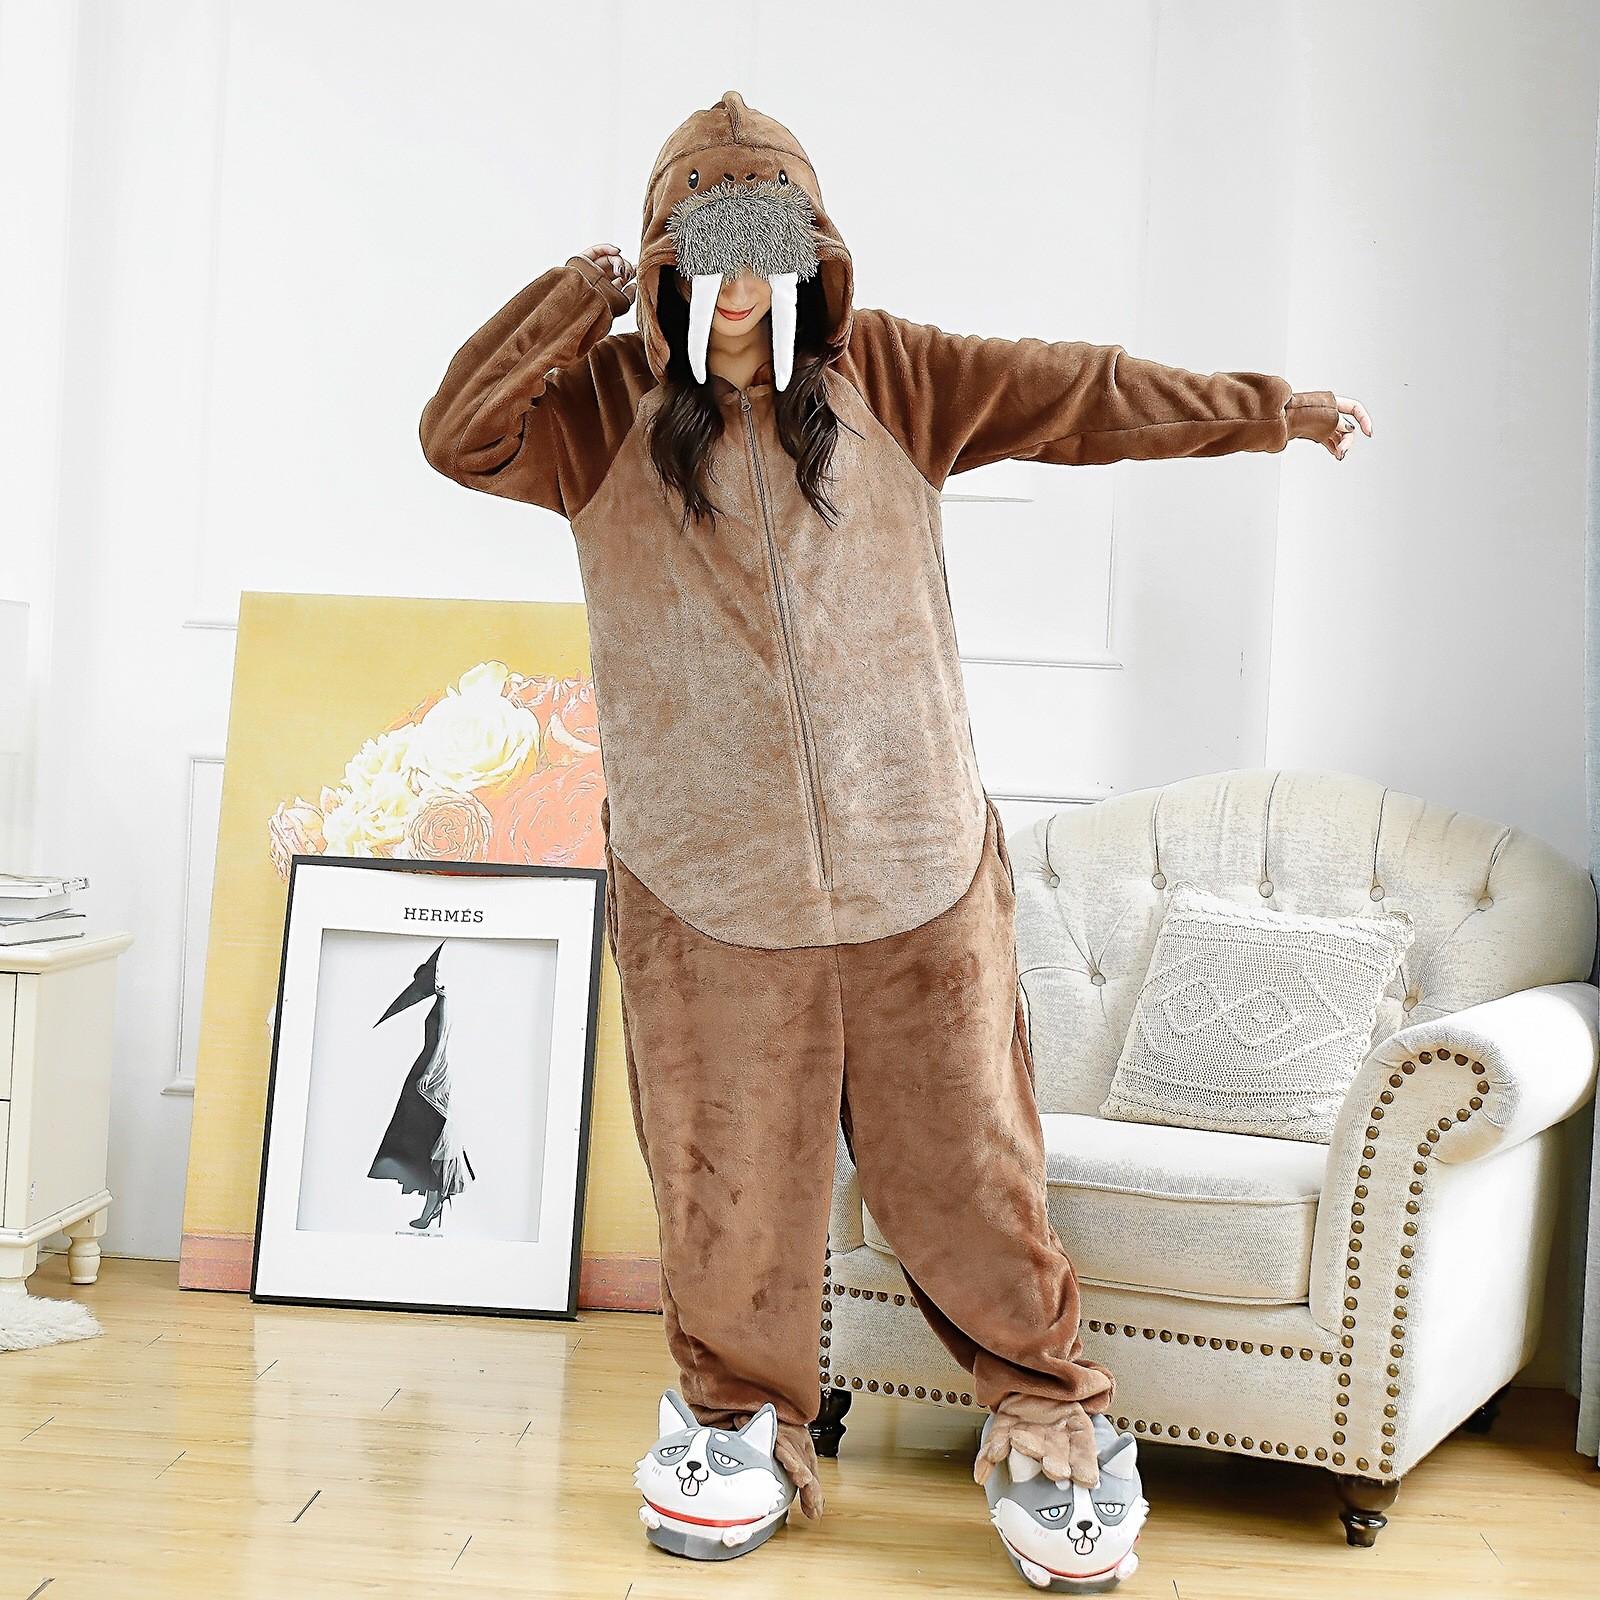 Details about  /Women Men Animal Kigurumi Cosplay Costume Walrus Pajamas for Adults Onesie0